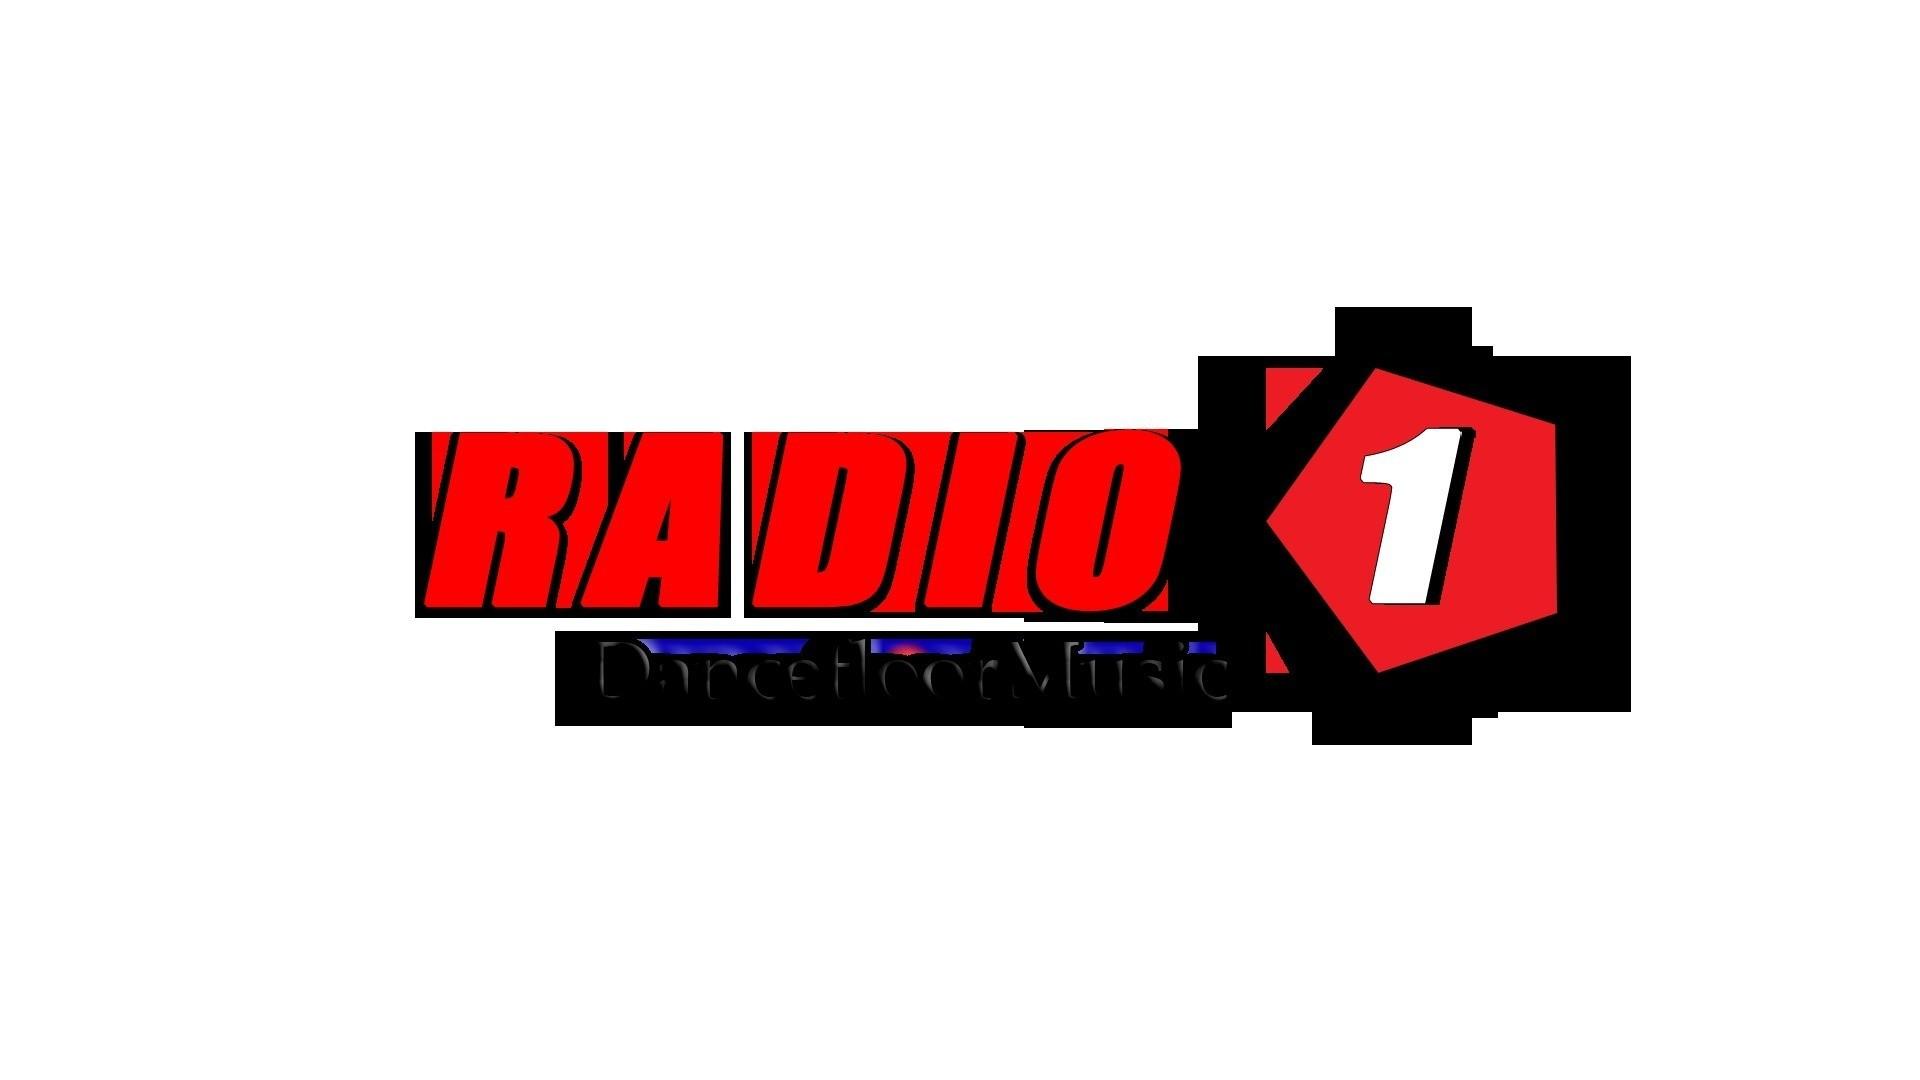 Radio1dfm